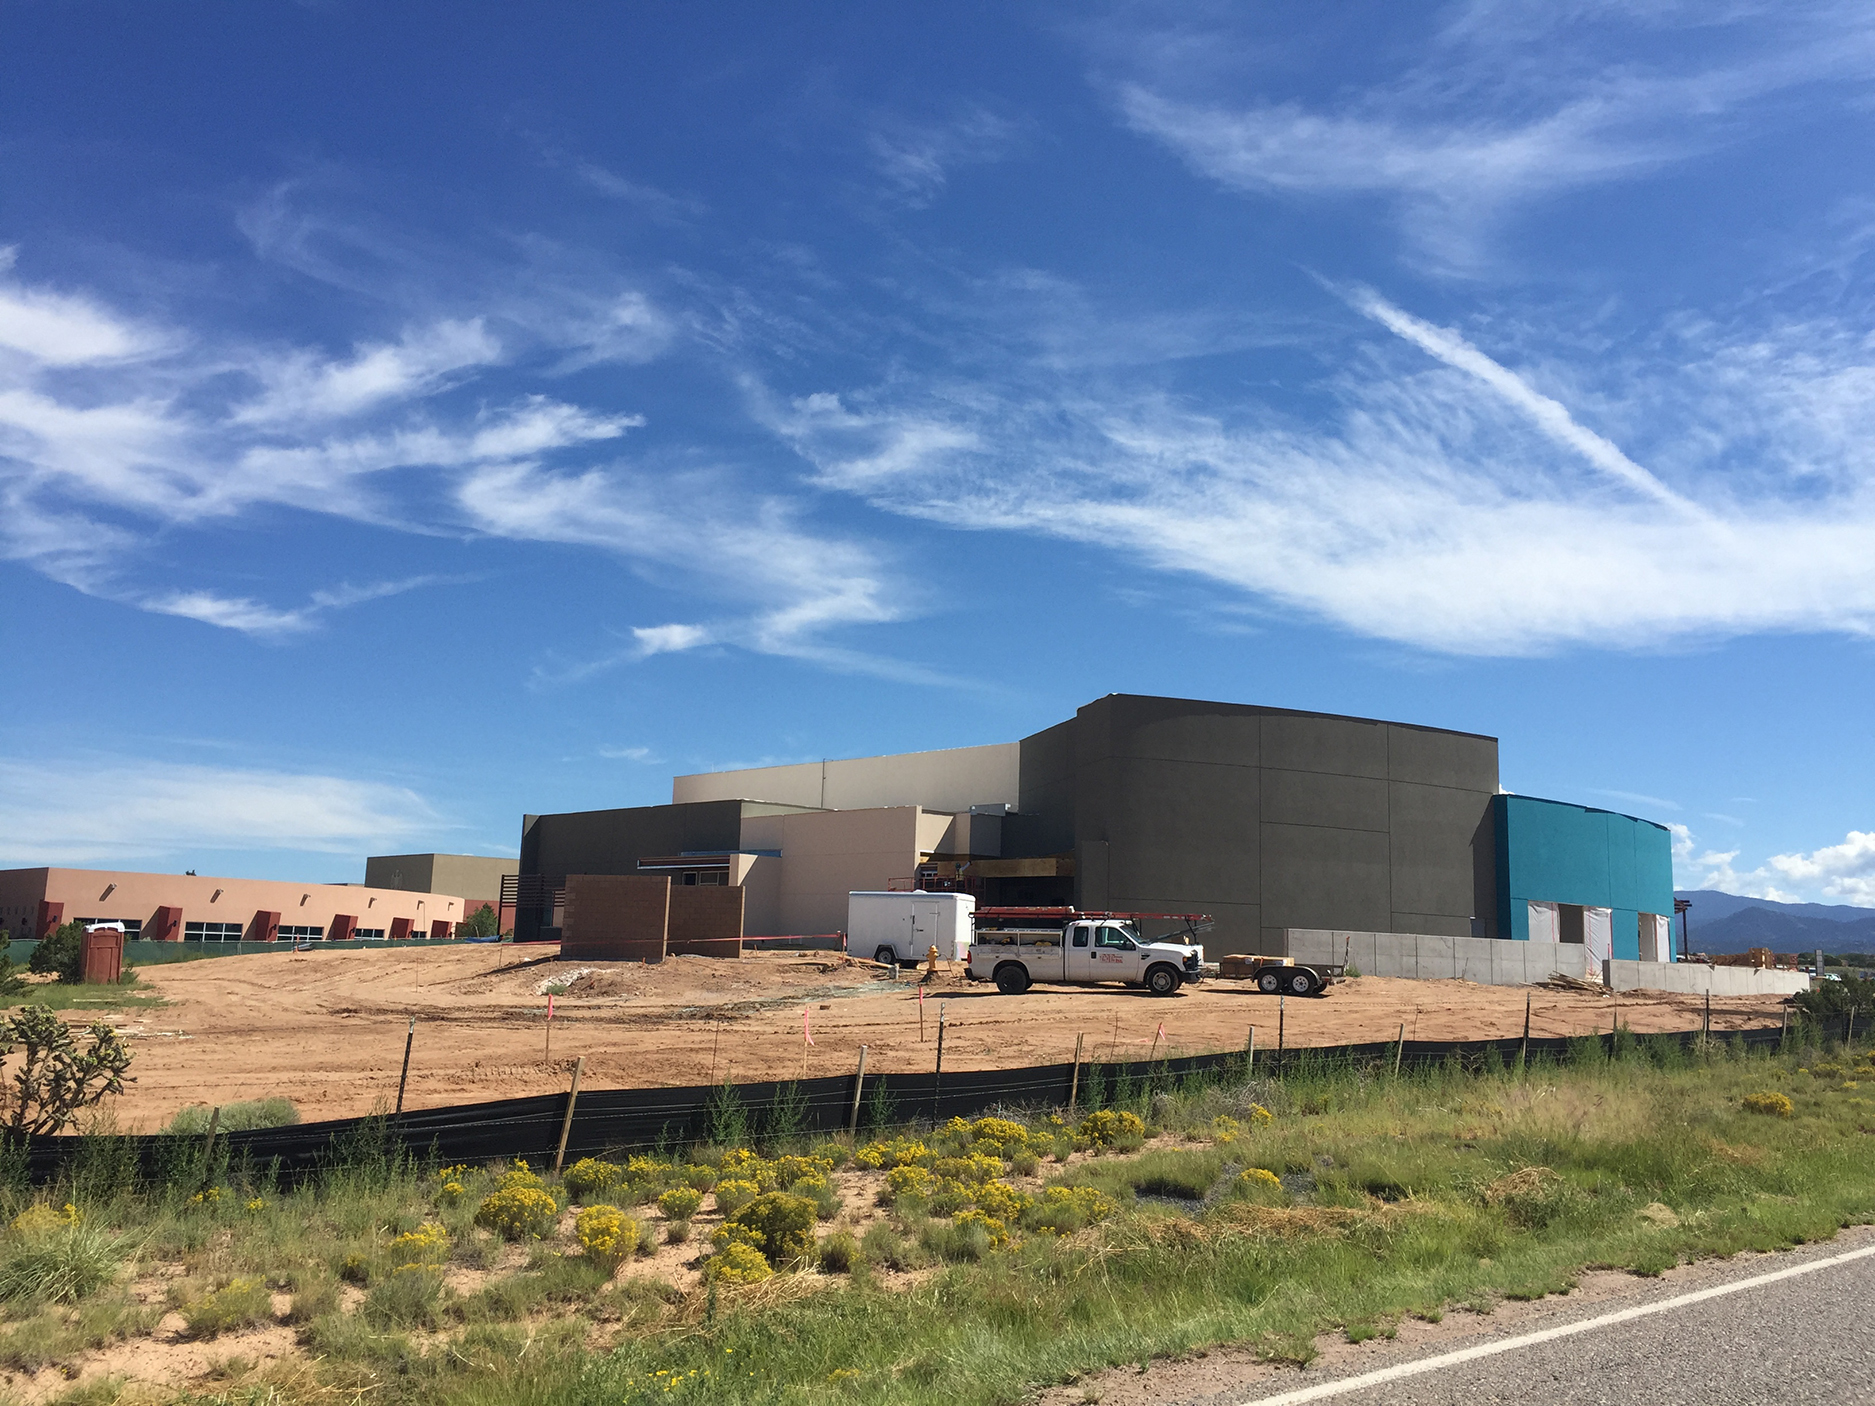 IAIA Multipurpose Center Construction